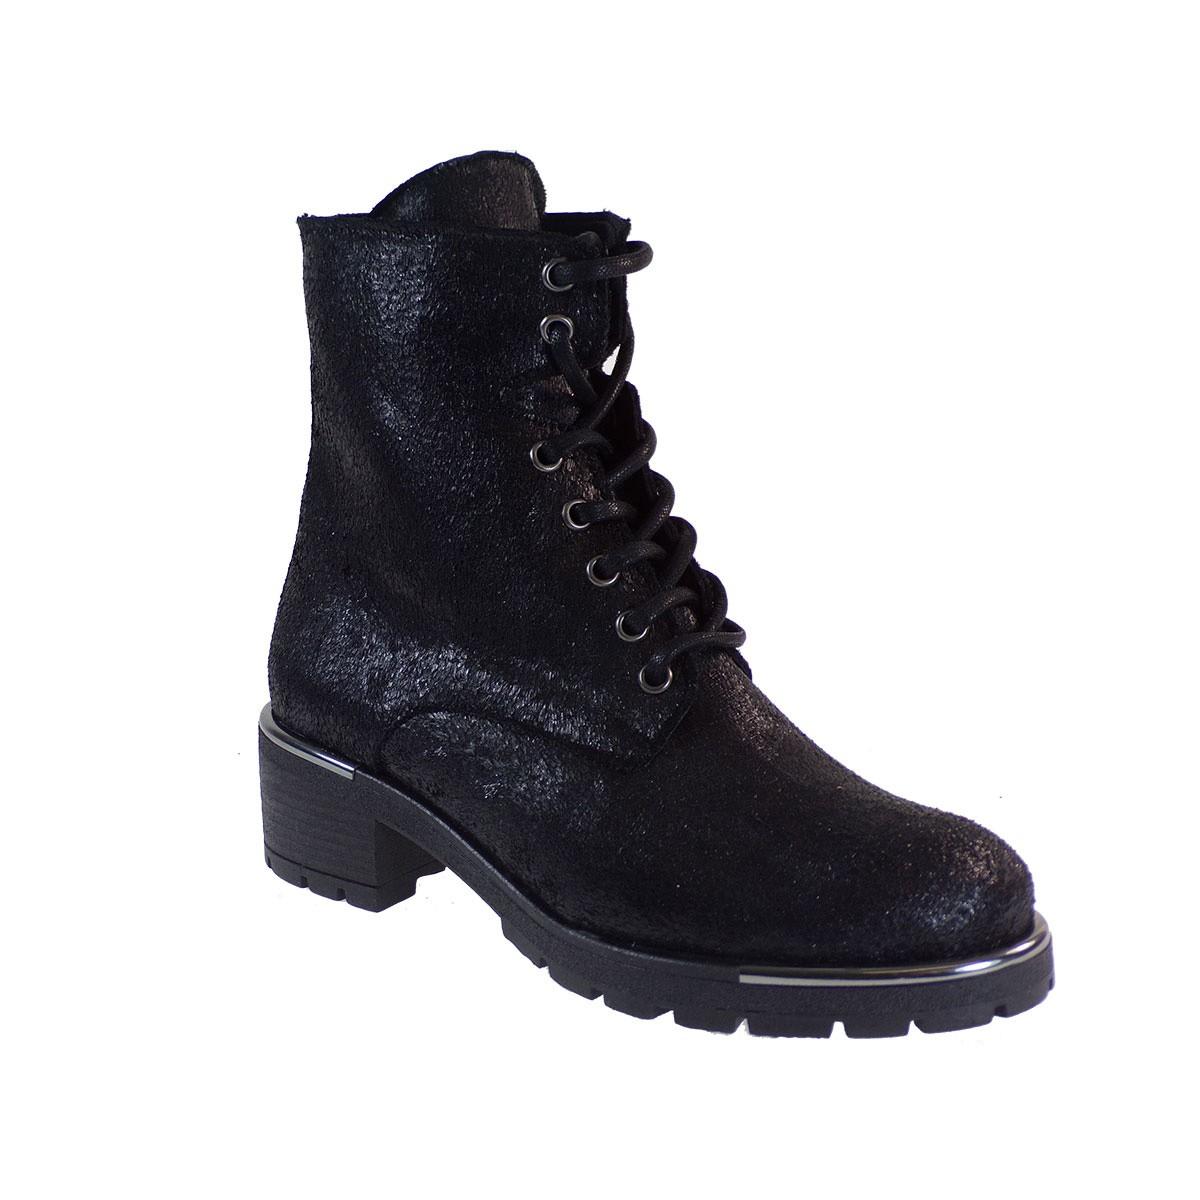 Smart Cronos Γυναικεία Παπούτσια Μποτάκια Αρβυλάκια 6700-TS72 Μαύρο